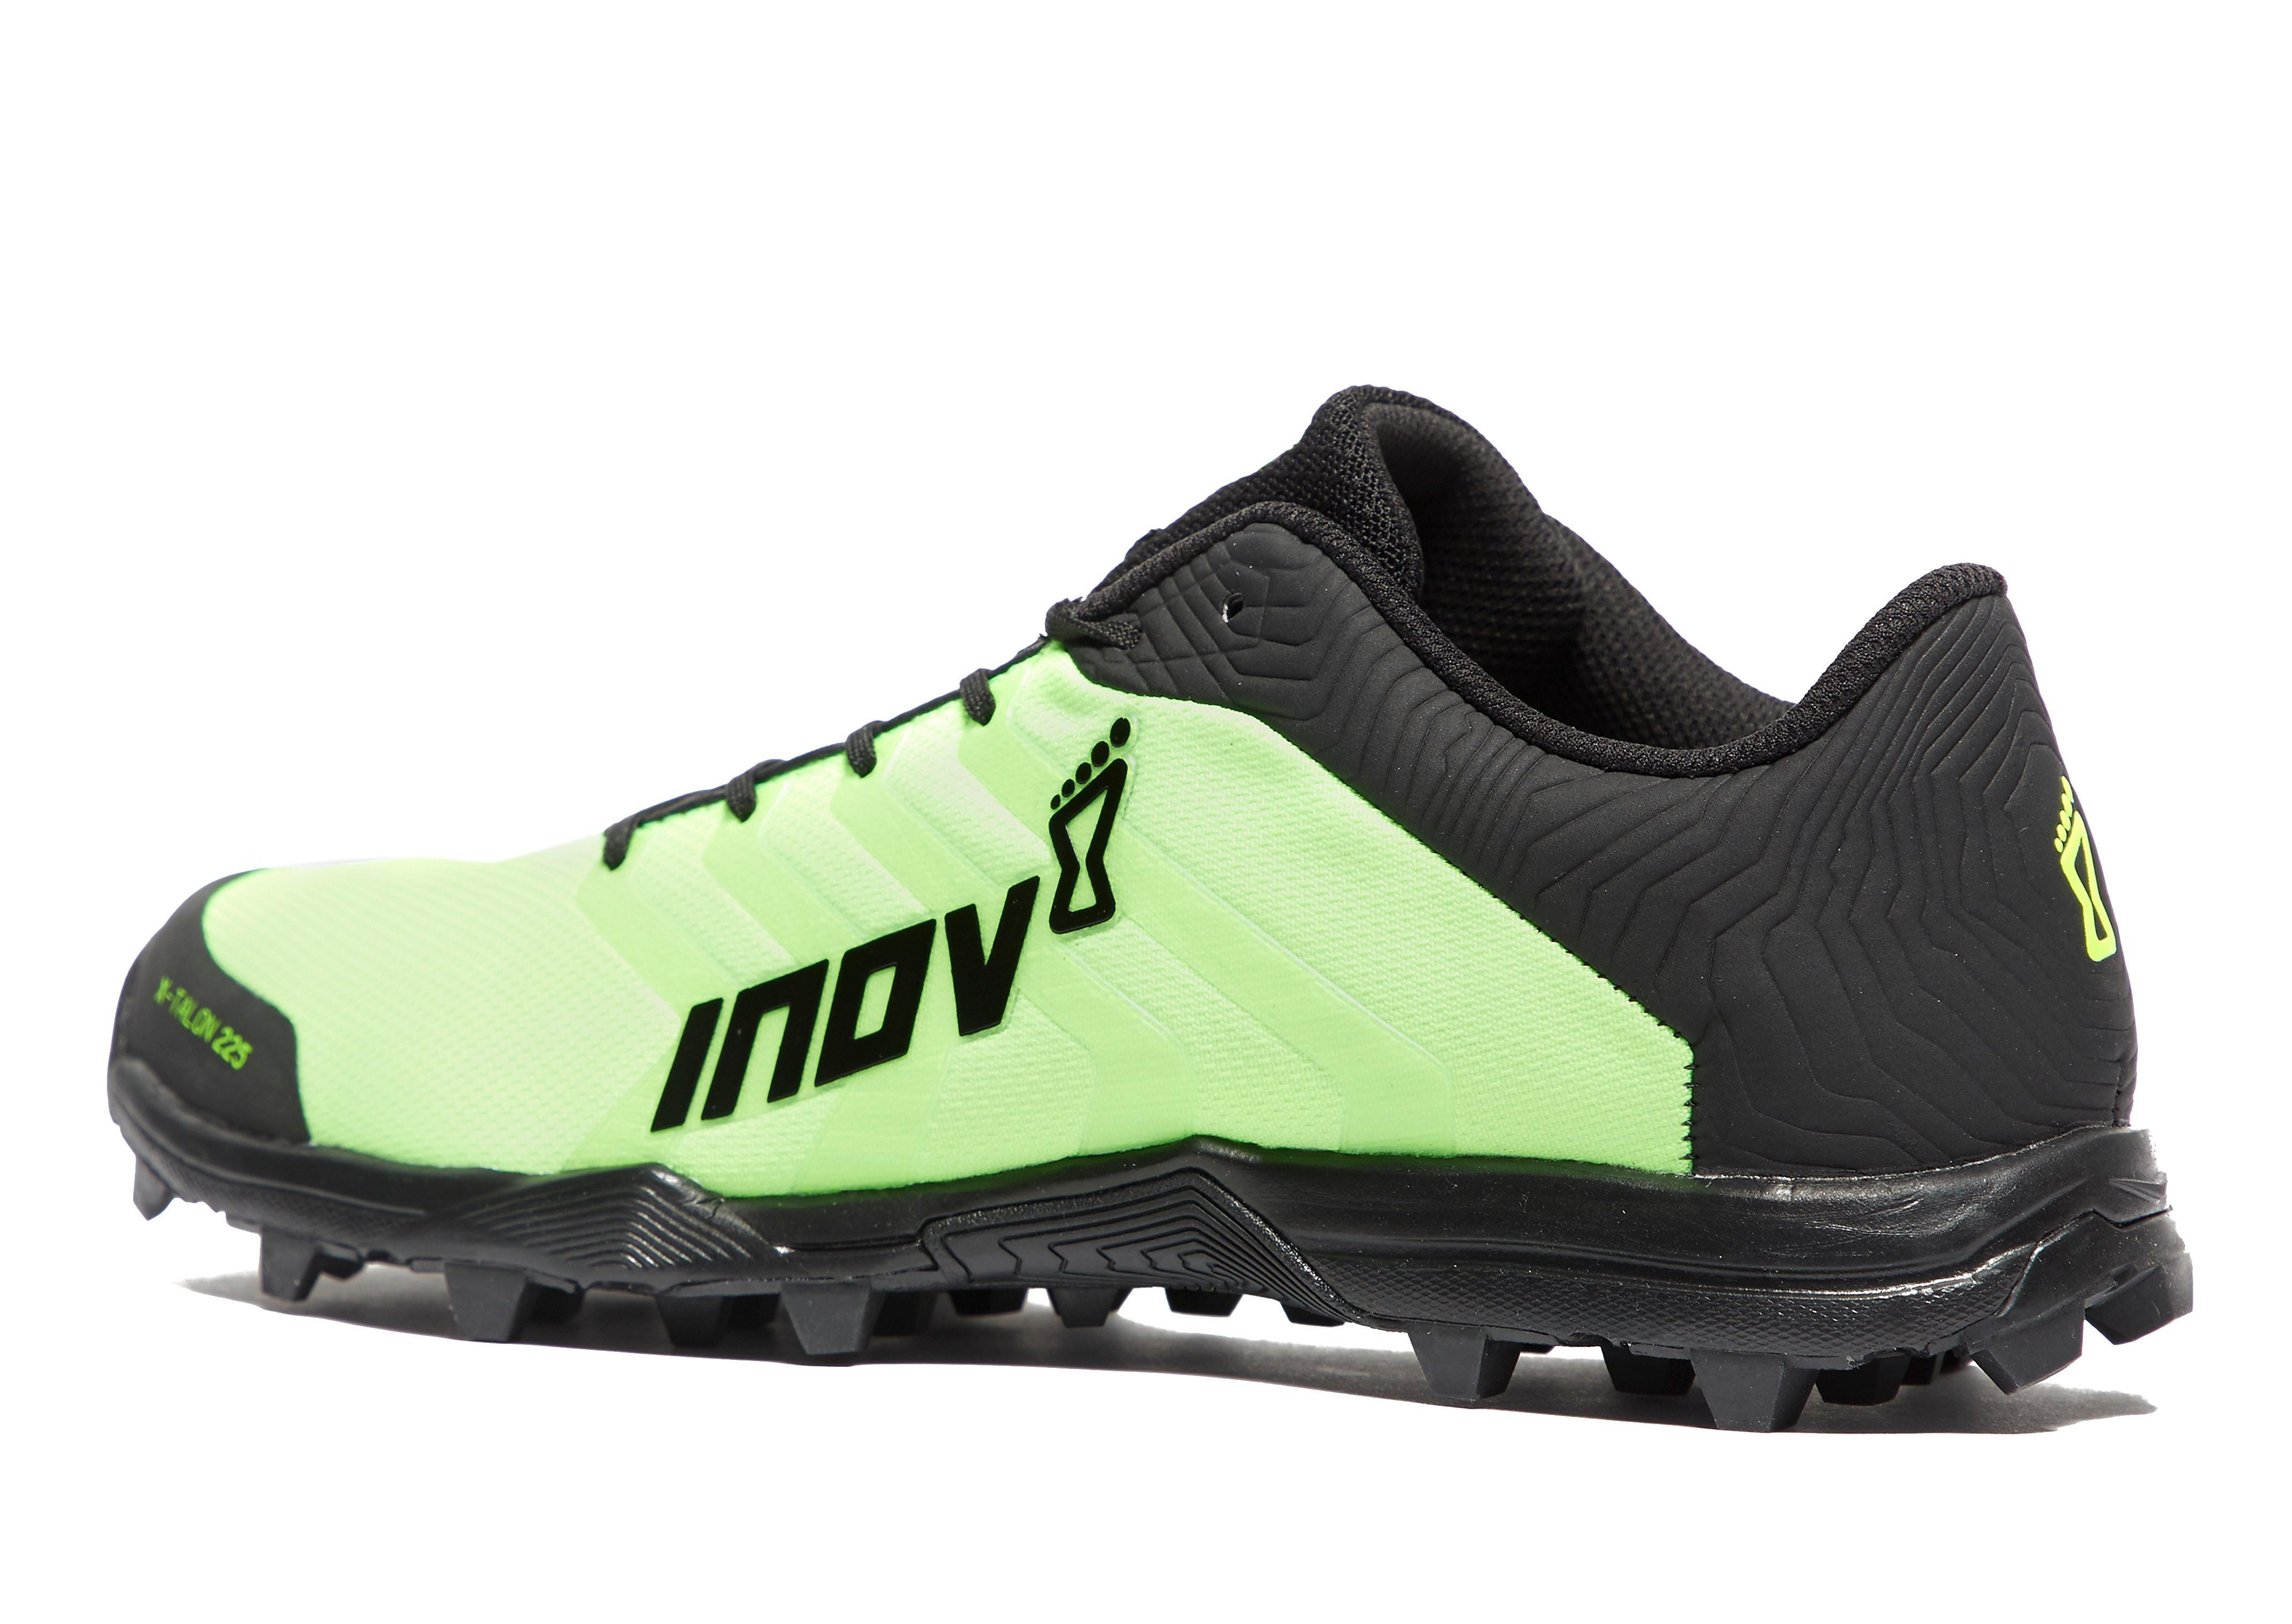 Inov-8 X-Talon 225 Unisex Trail Running Shoes